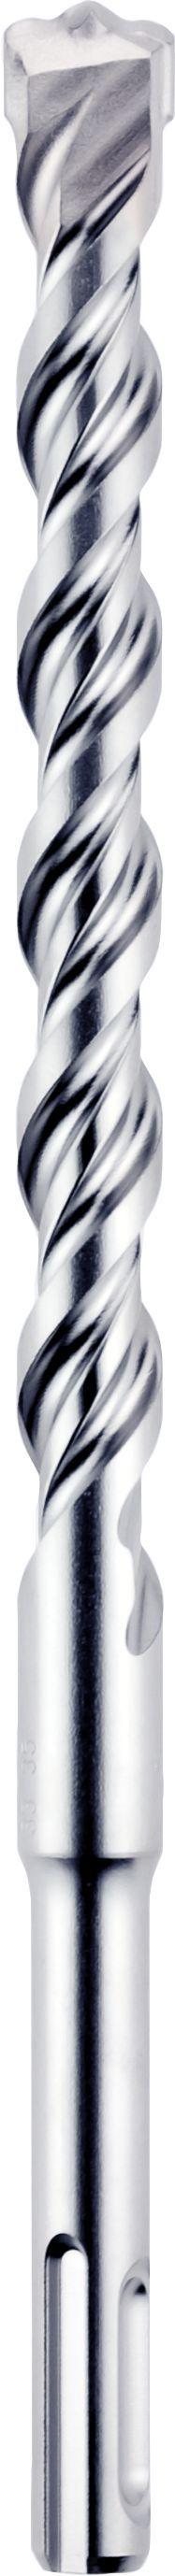 Slika BORER Rocket 3 SDS-plus 24x450 mm